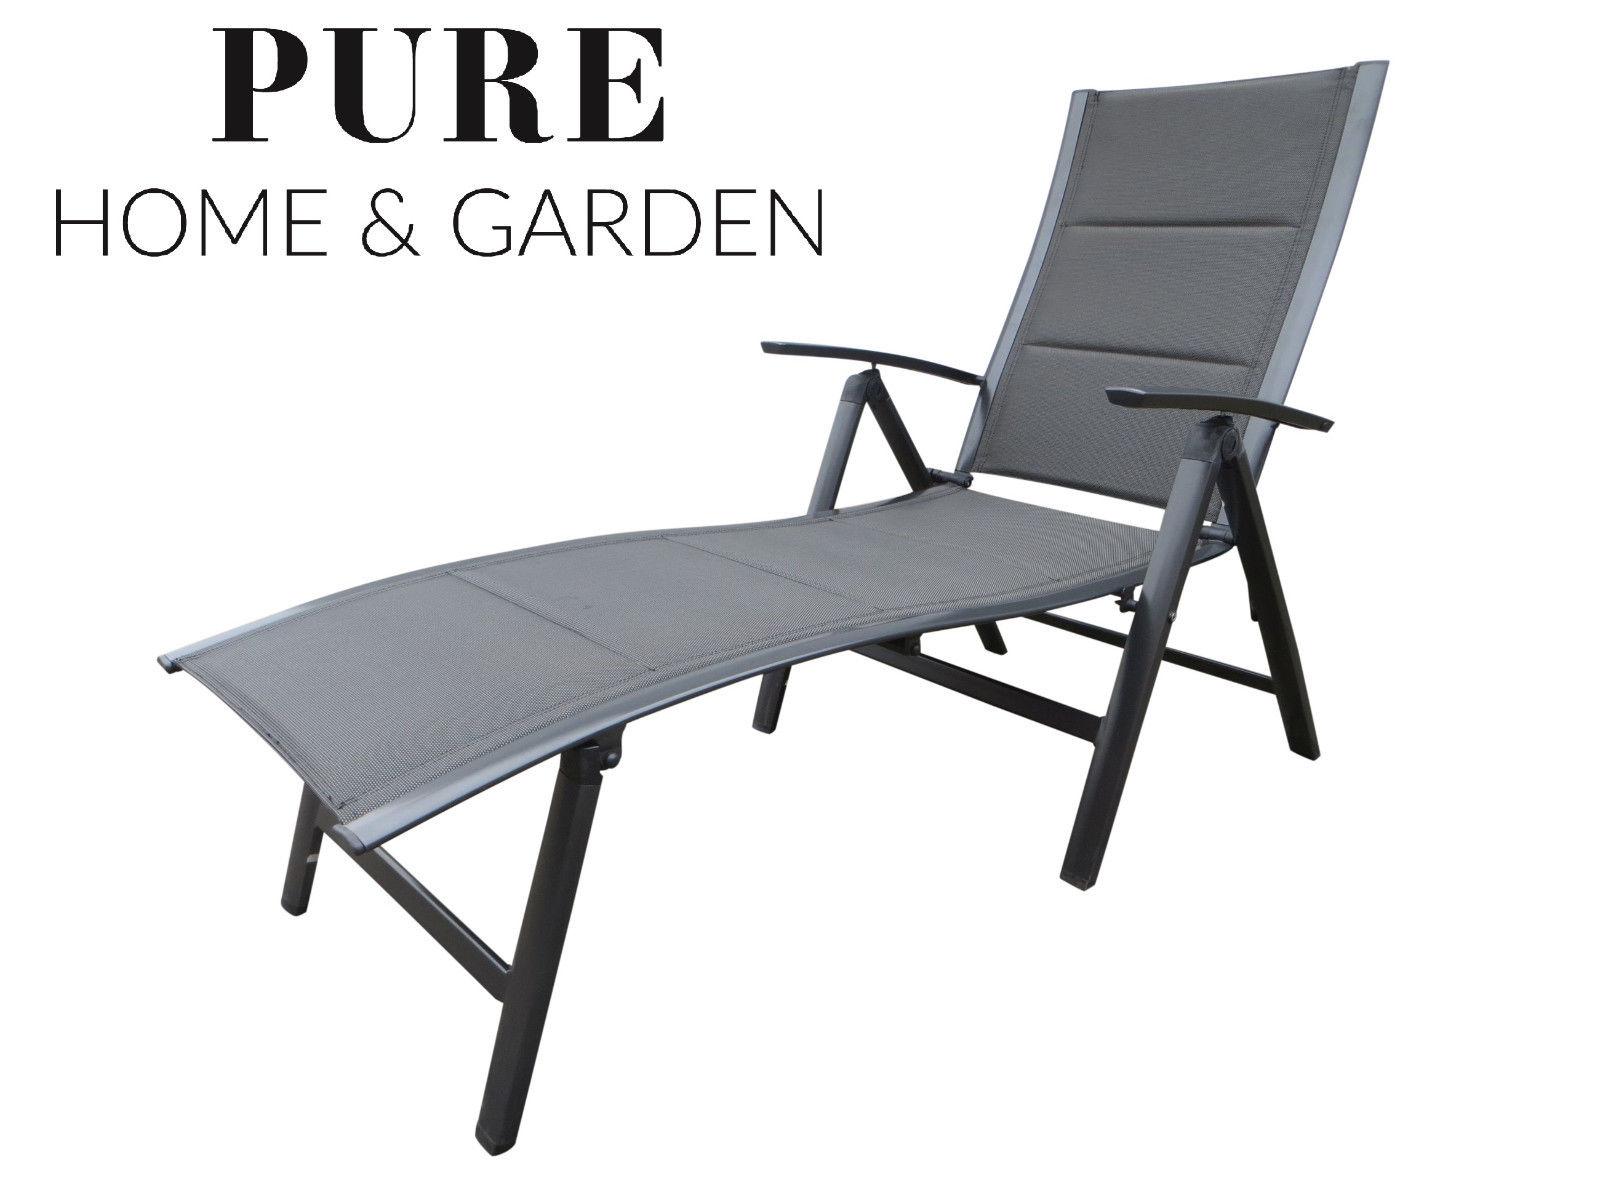 nox padded alu sonnenliege klappliege anthrazit mixed taupe gartenliegen garten. Black Bedroom Furniture Sets. Home Design Ideas